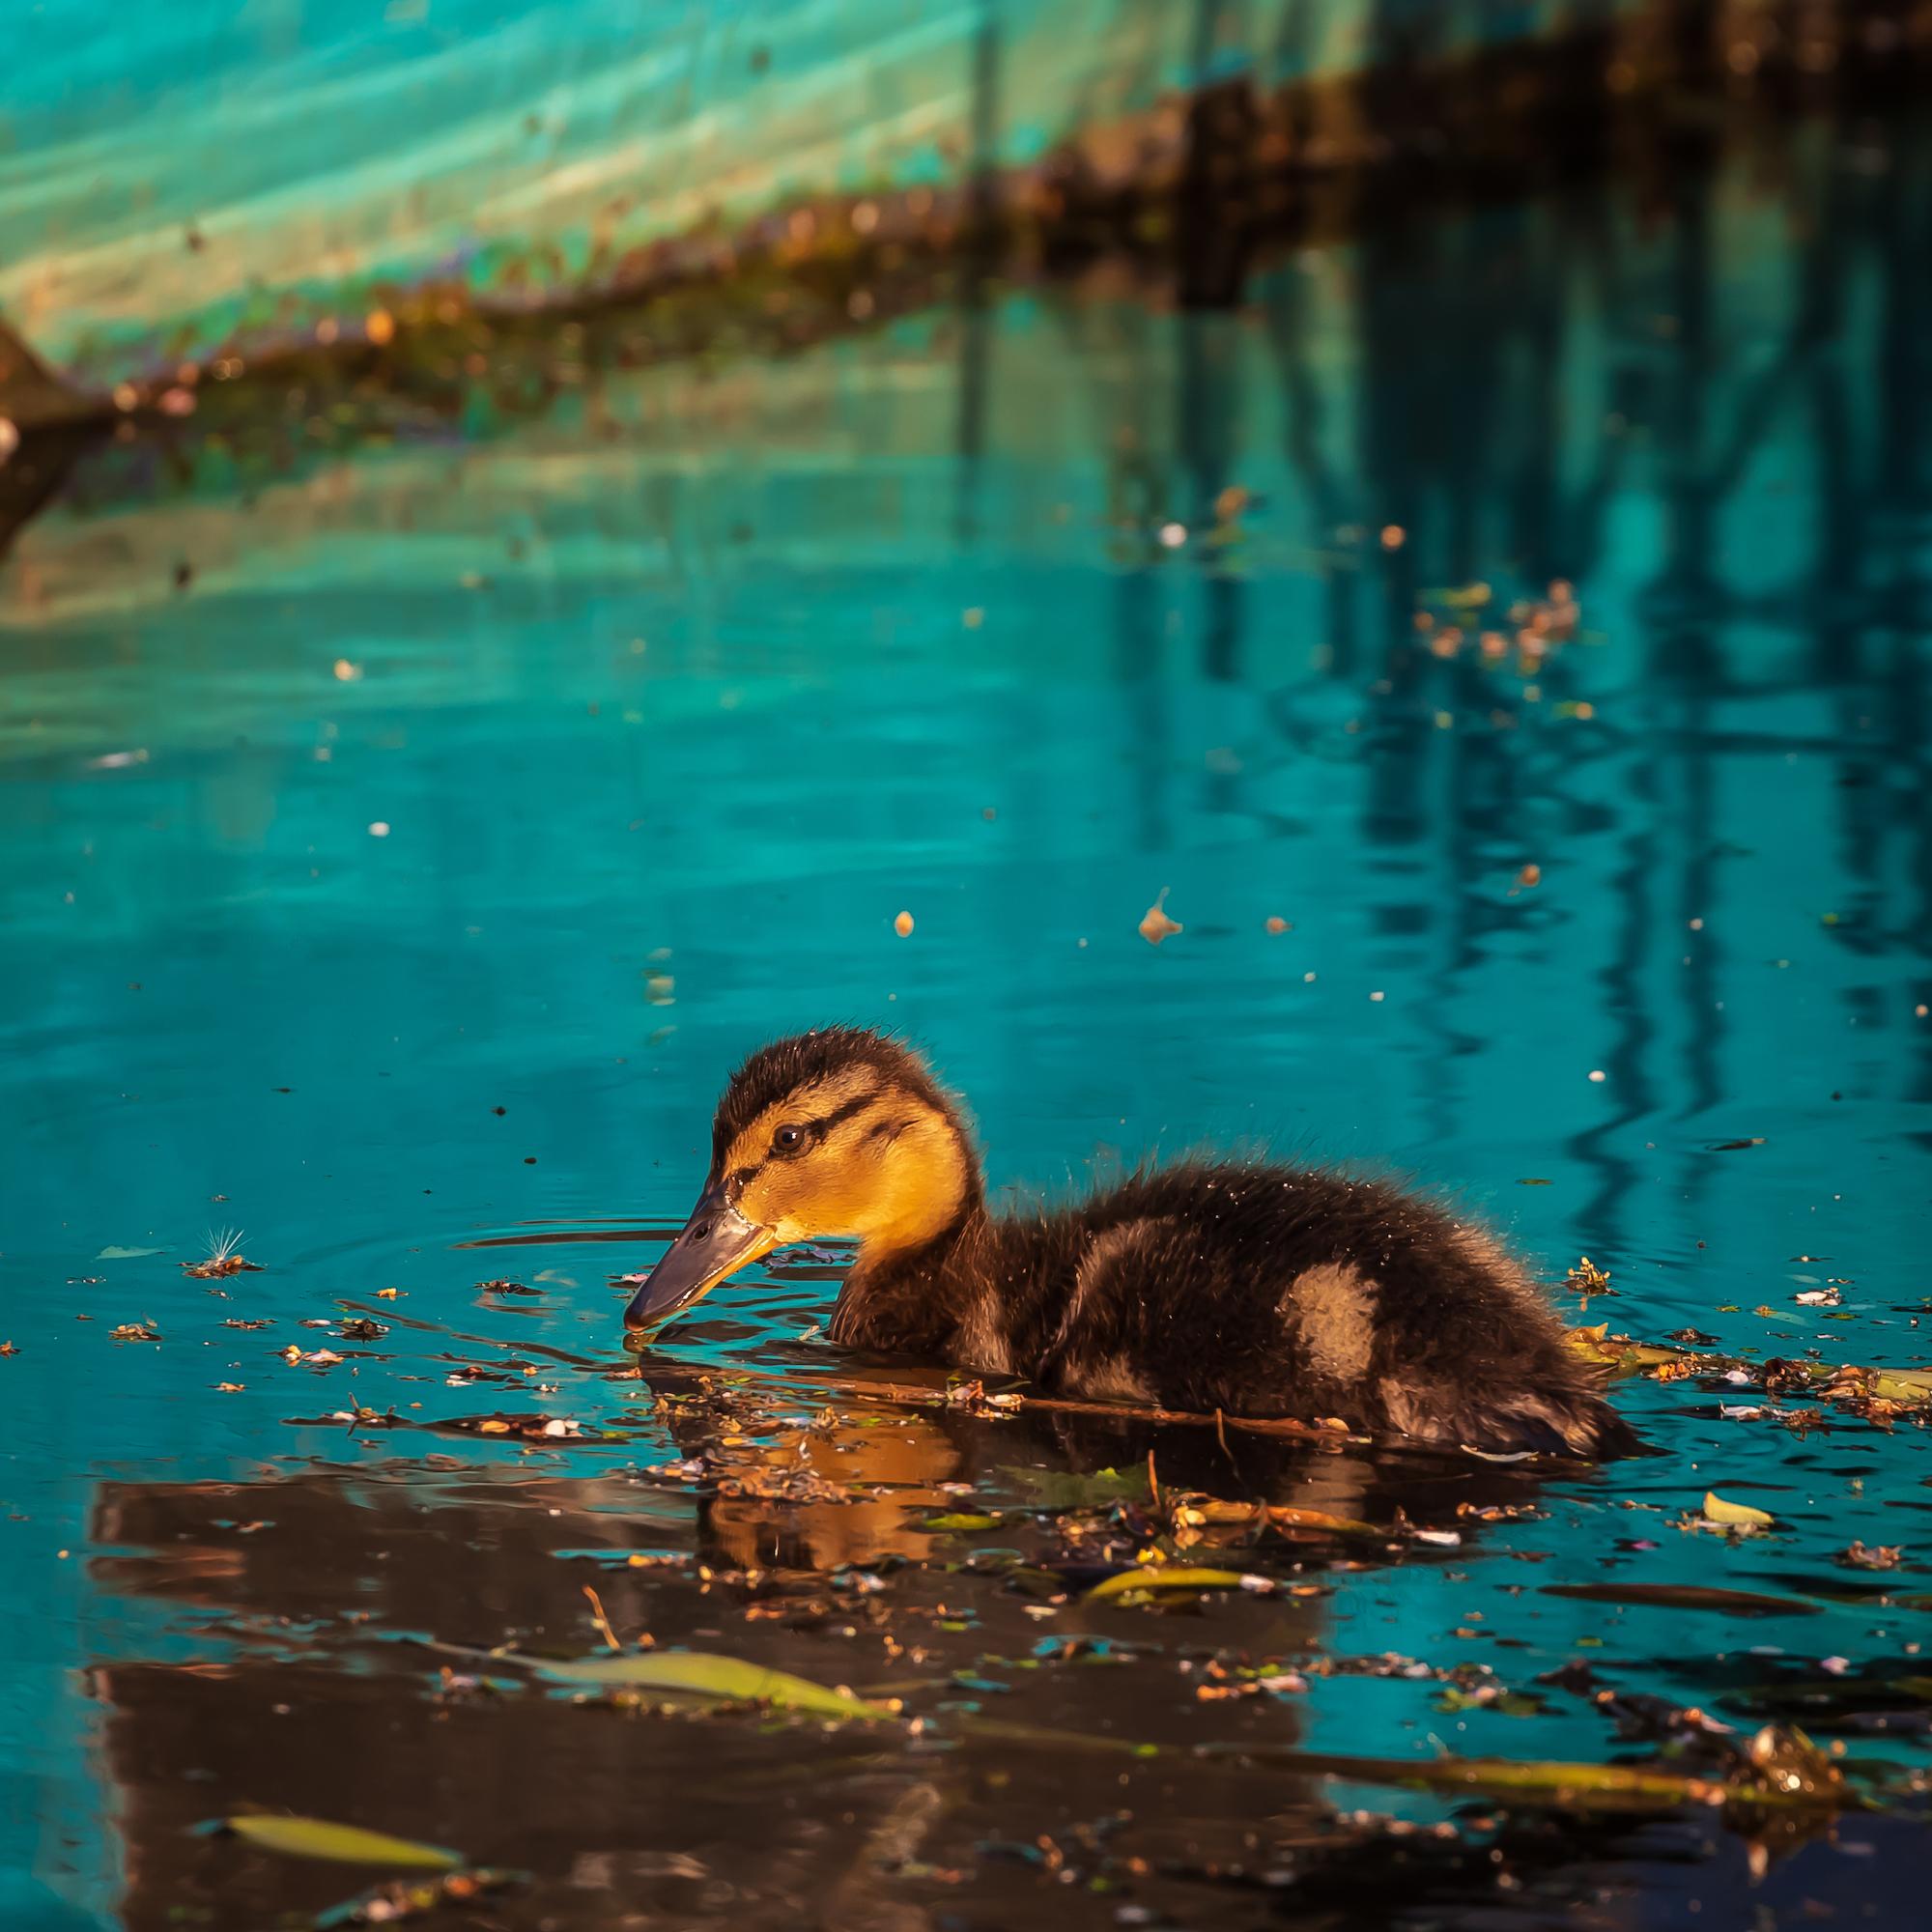 (1394) Mallard Duckling, The Union Canal, Ratho, West Edinburgh, Scotland. June 2019. Copyright David Wheater.jpg